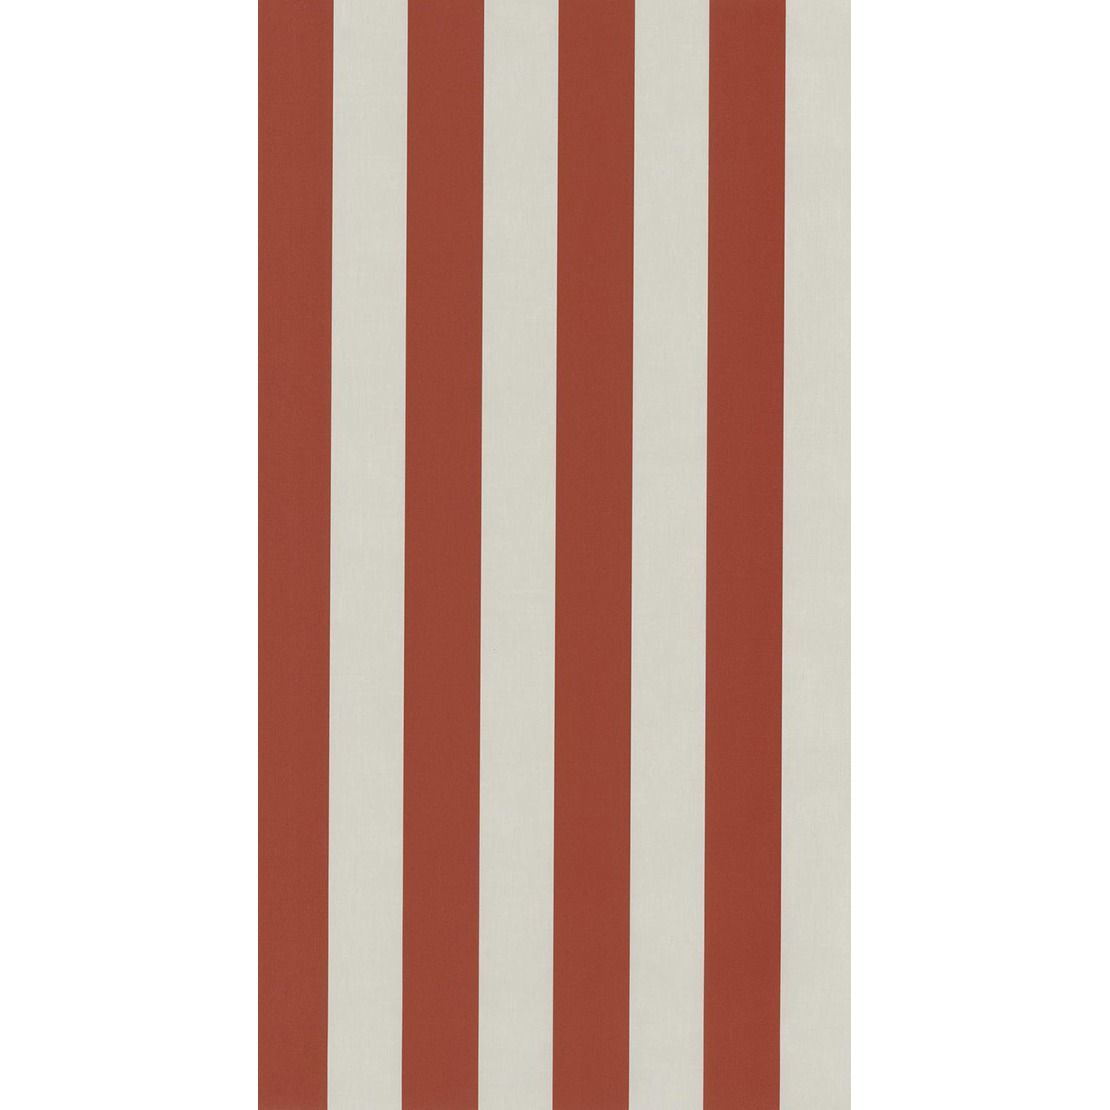 Французские обои Casadeco,  коллекция Baltic, артикулBTI29258111